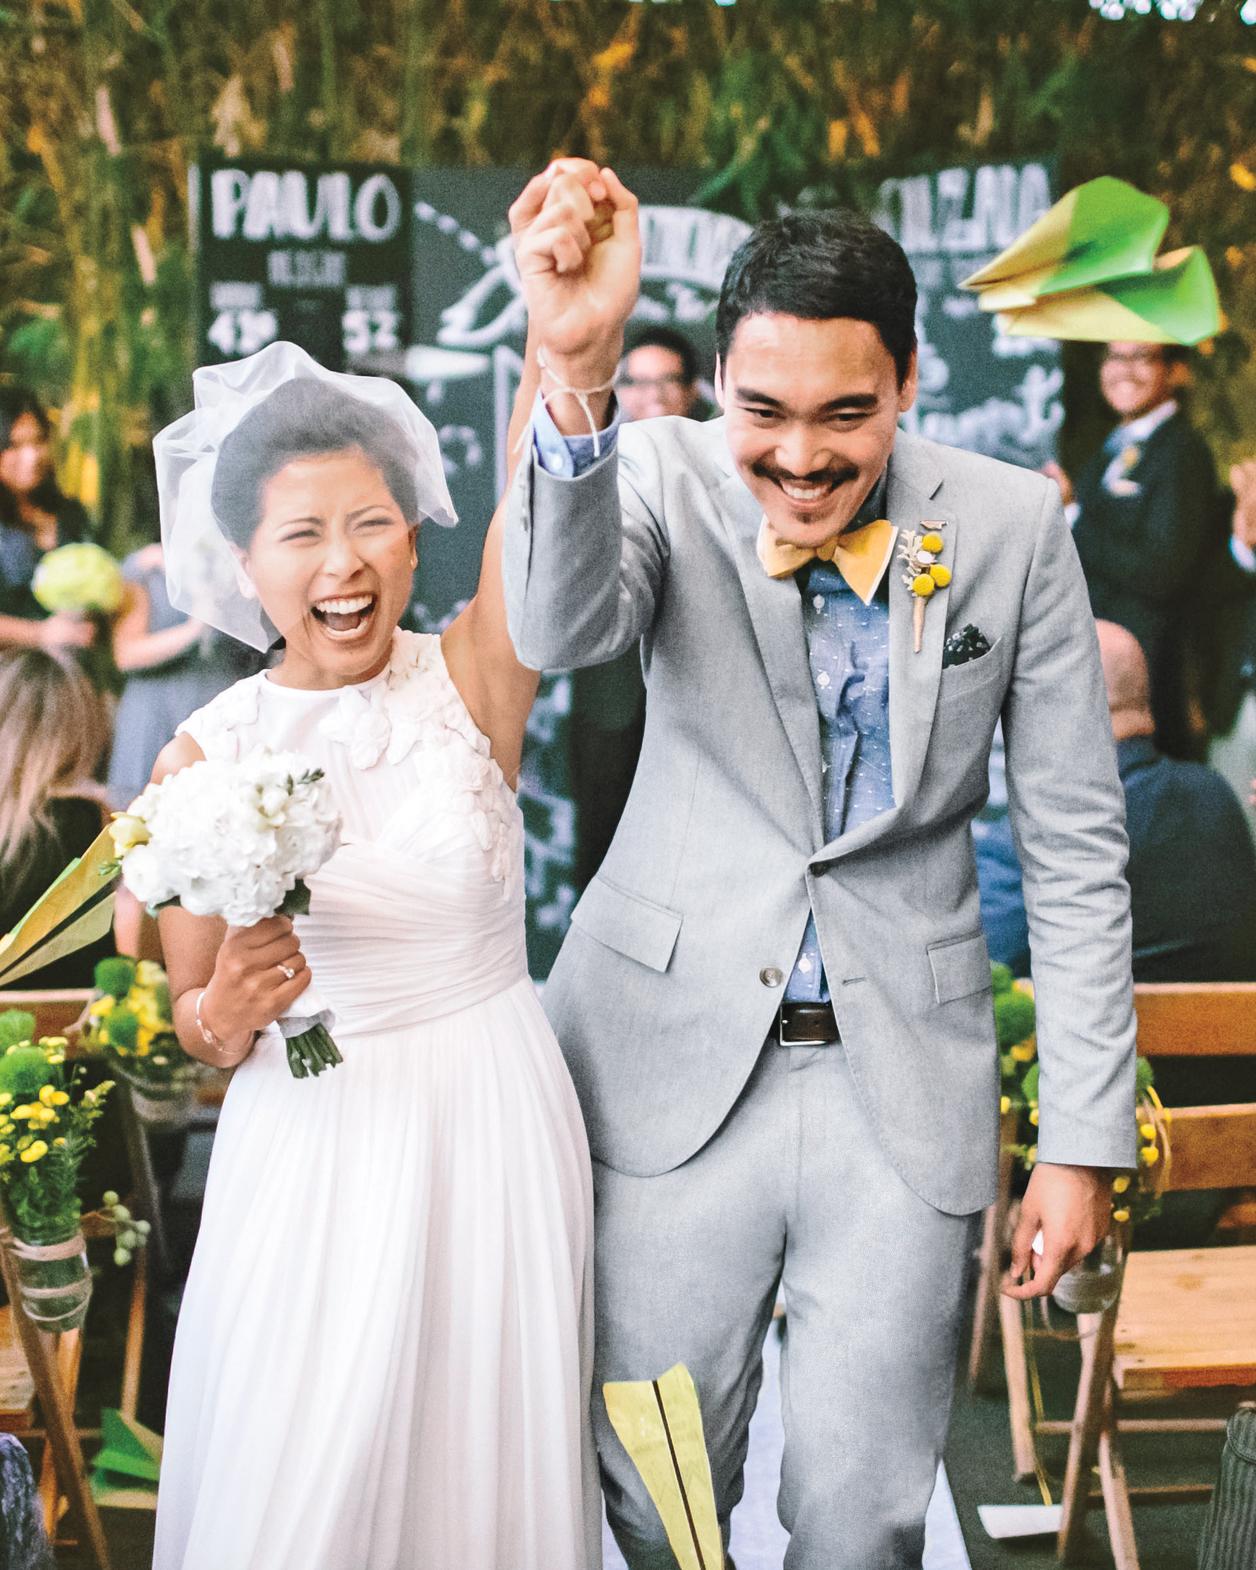 bride-groom-matt-melissa-top-selects65-mwds111011.jpg